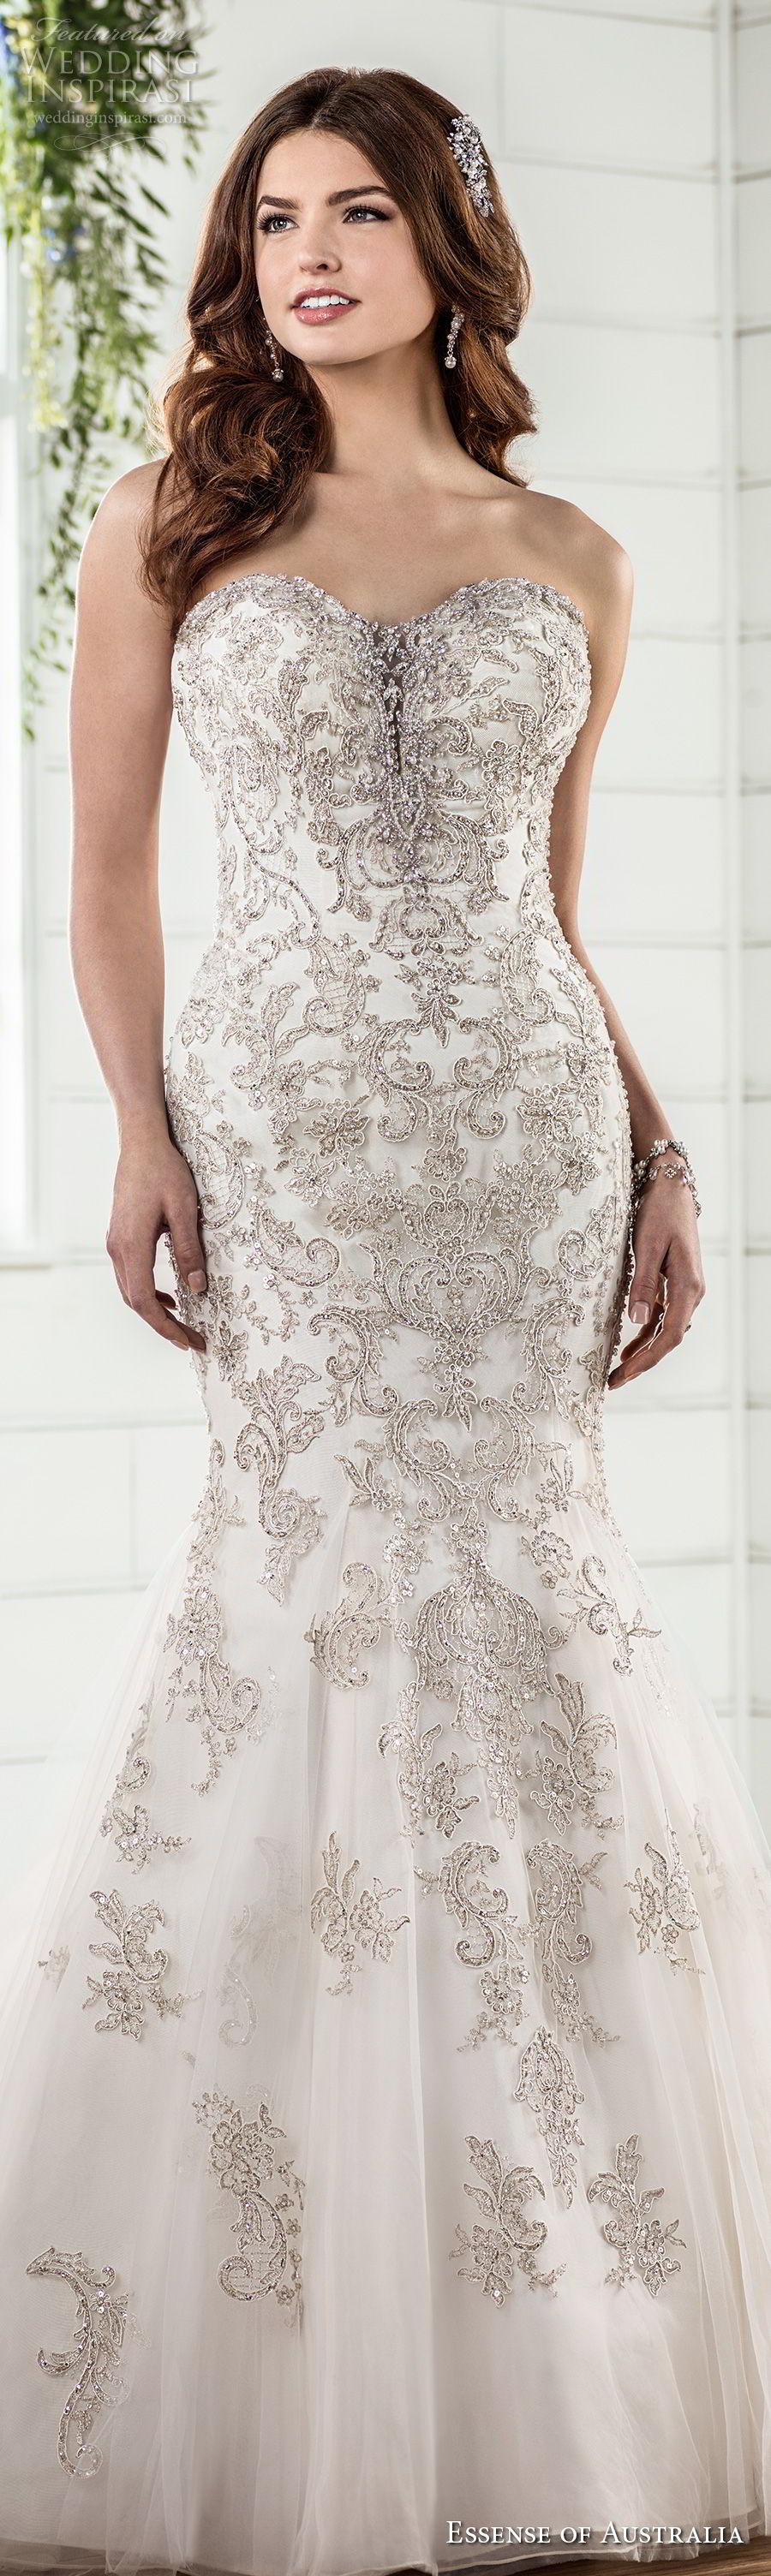 essense australia fall 2017 bridal strapless sweetheart neckline heavily embellished beaded bodice elegant glamorous mermaid wedding dress chapel train (01) lv